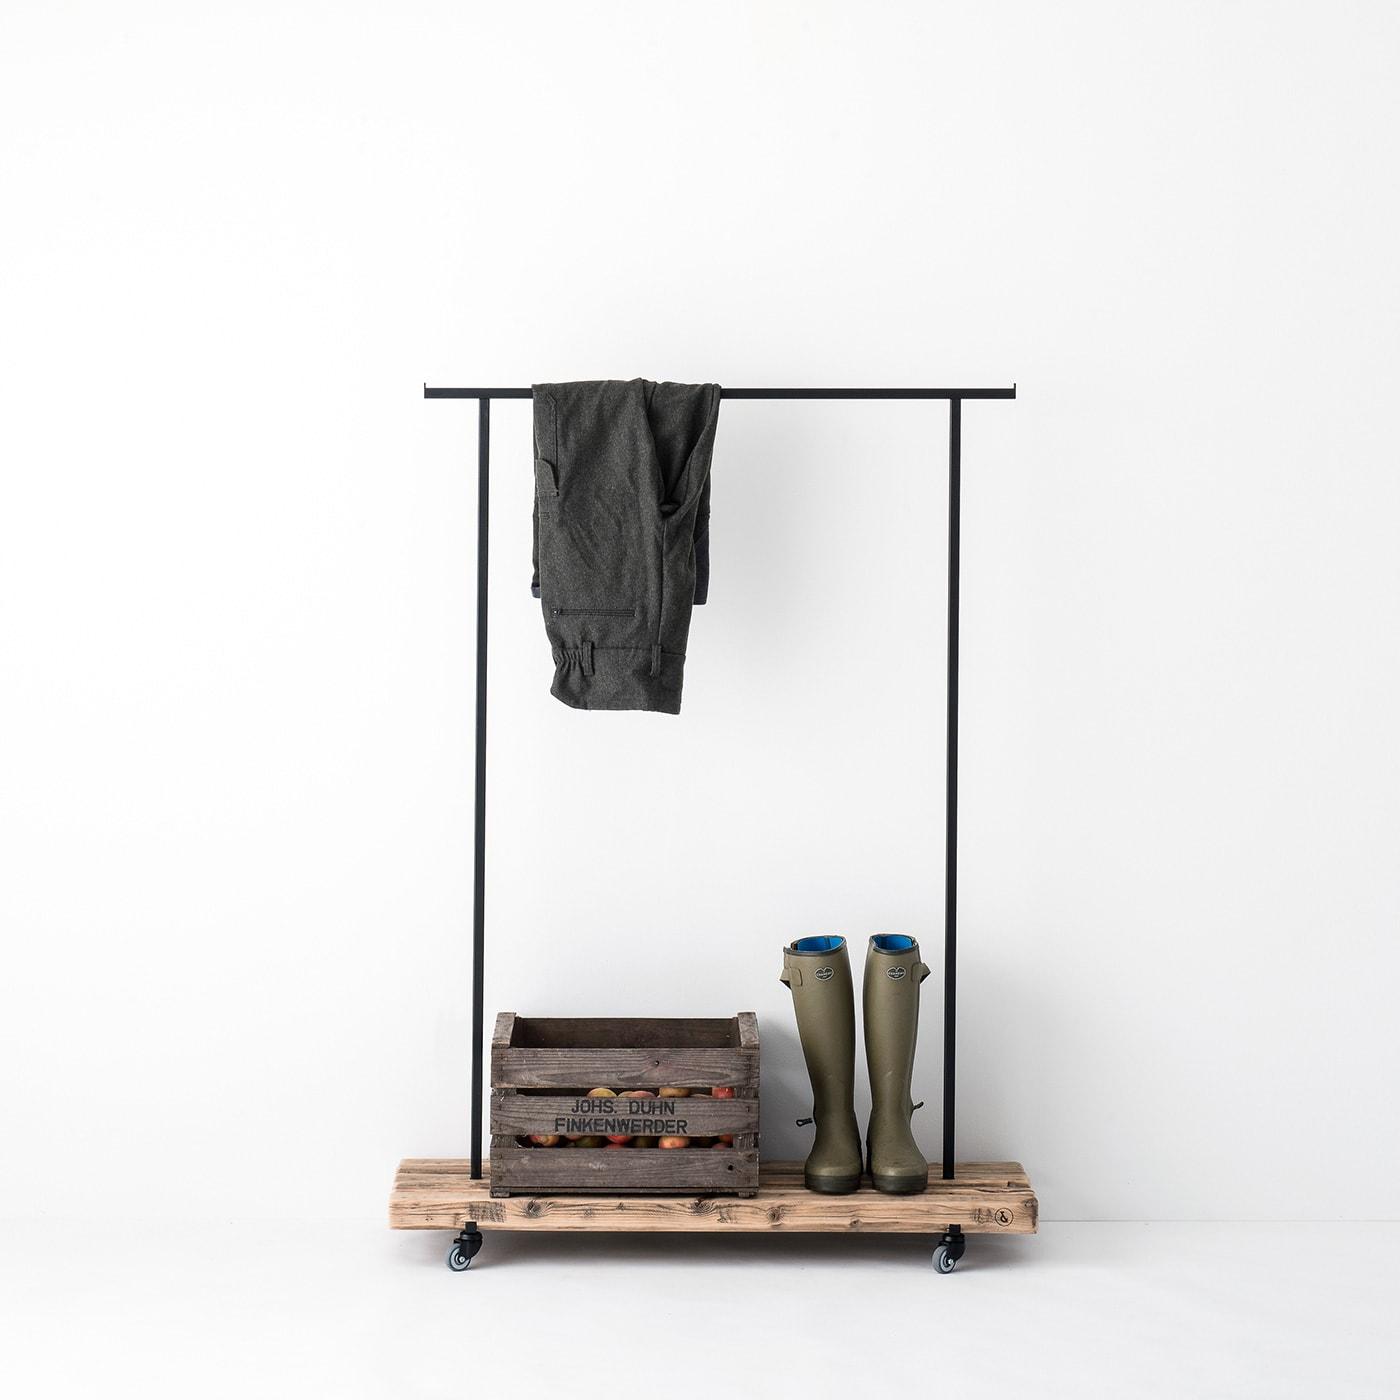 kleiderstange 01 altholz massivholz braun garderobe metall schwarz weldco 02